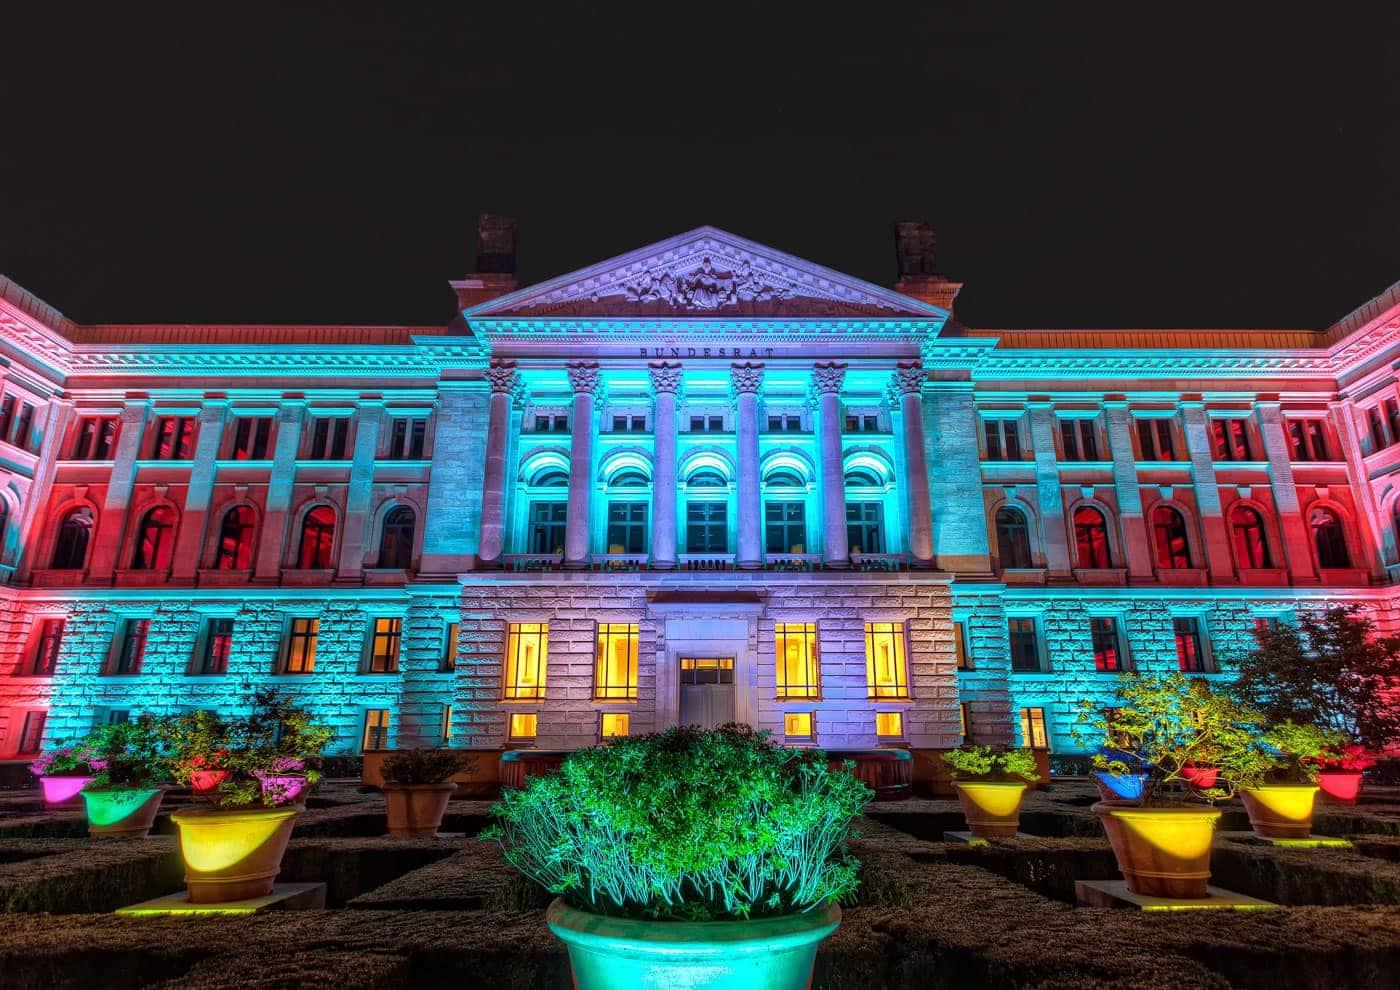 Bundesrat in Berlin Germany. Illuminated at the Festival of Lights 2013